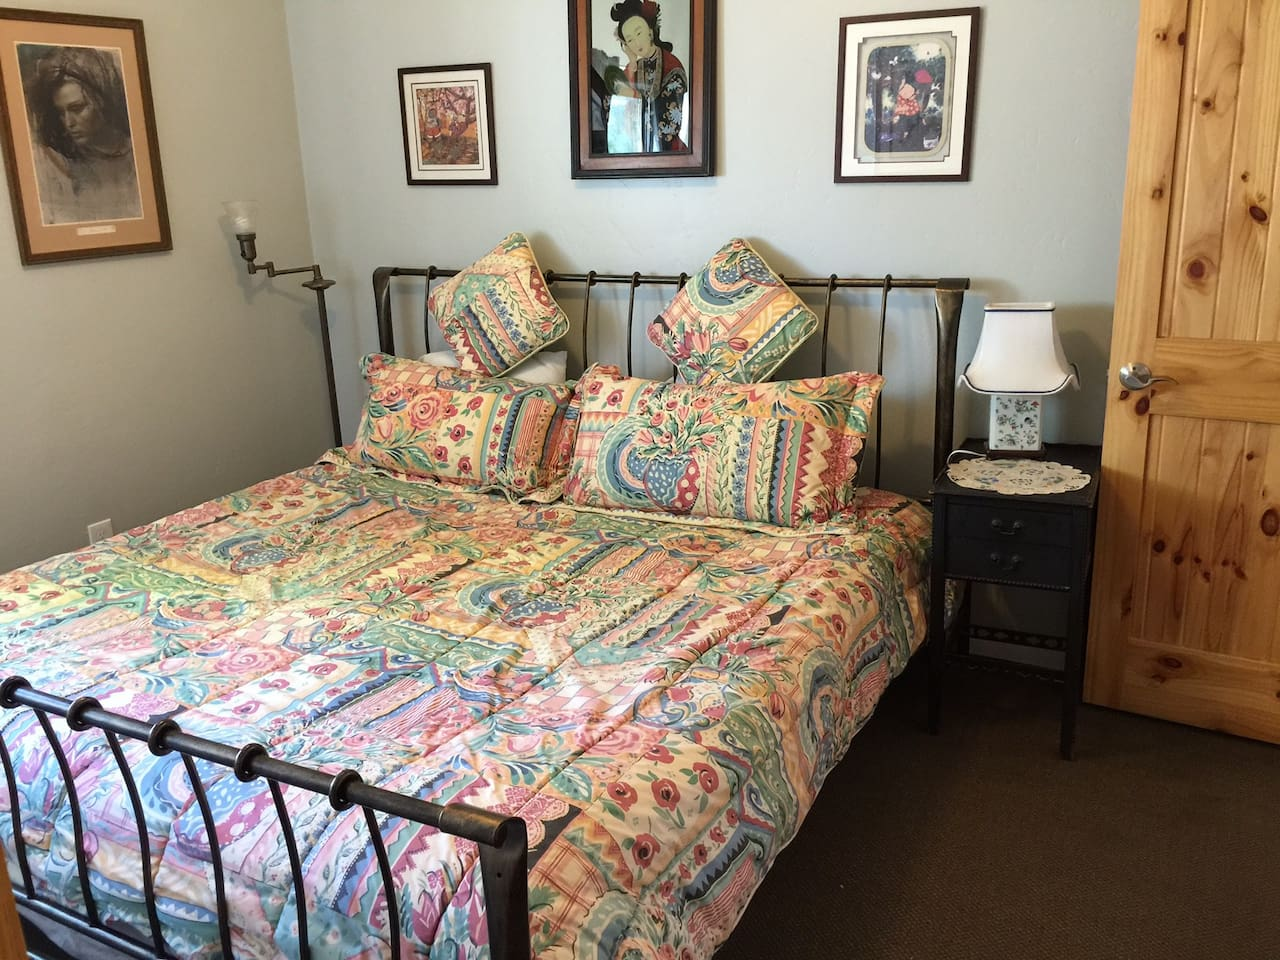 The bedroom has king size organic latex mattress